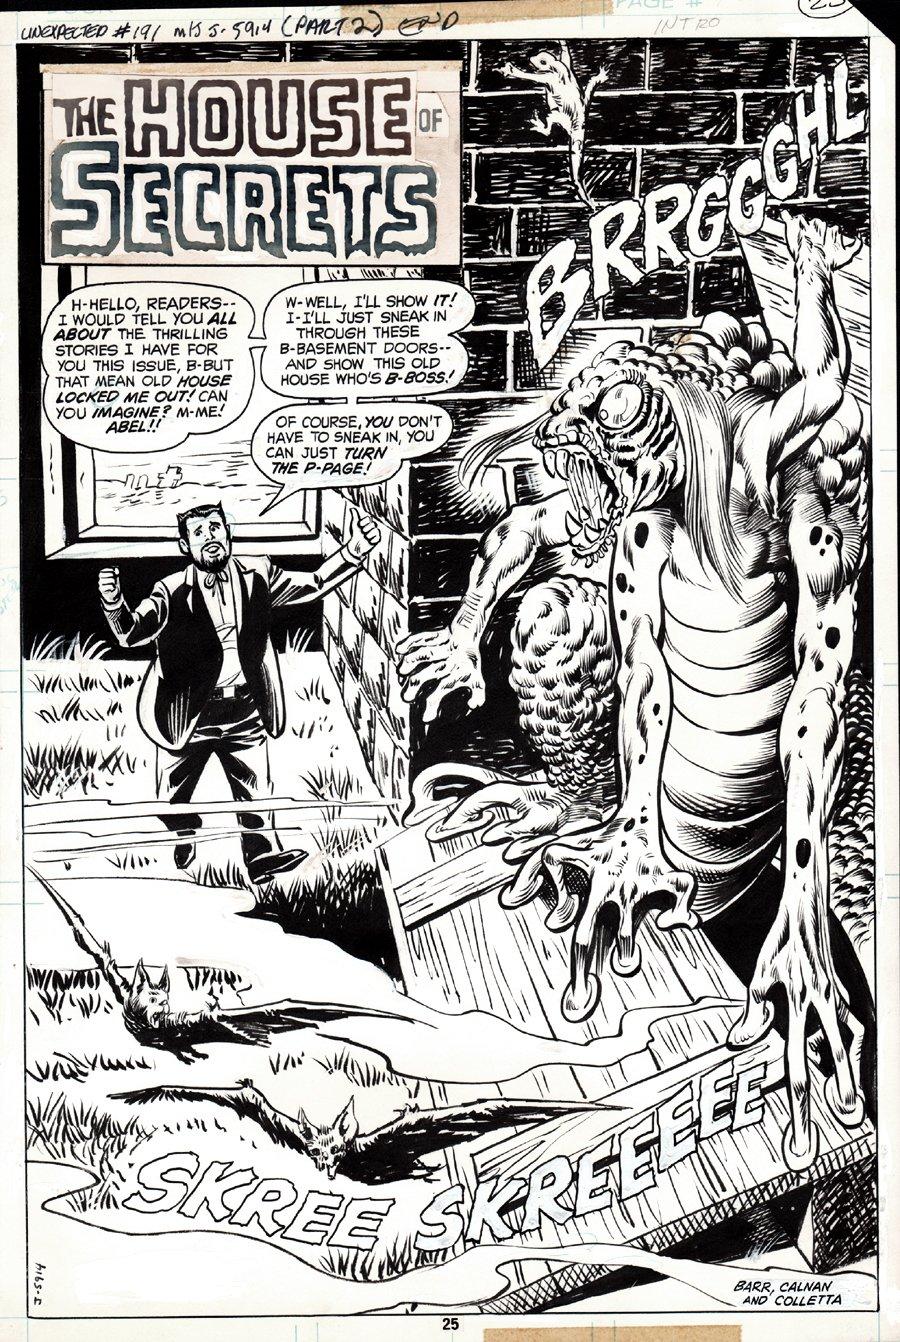 The Unexpected #191 SPLASH (1979)